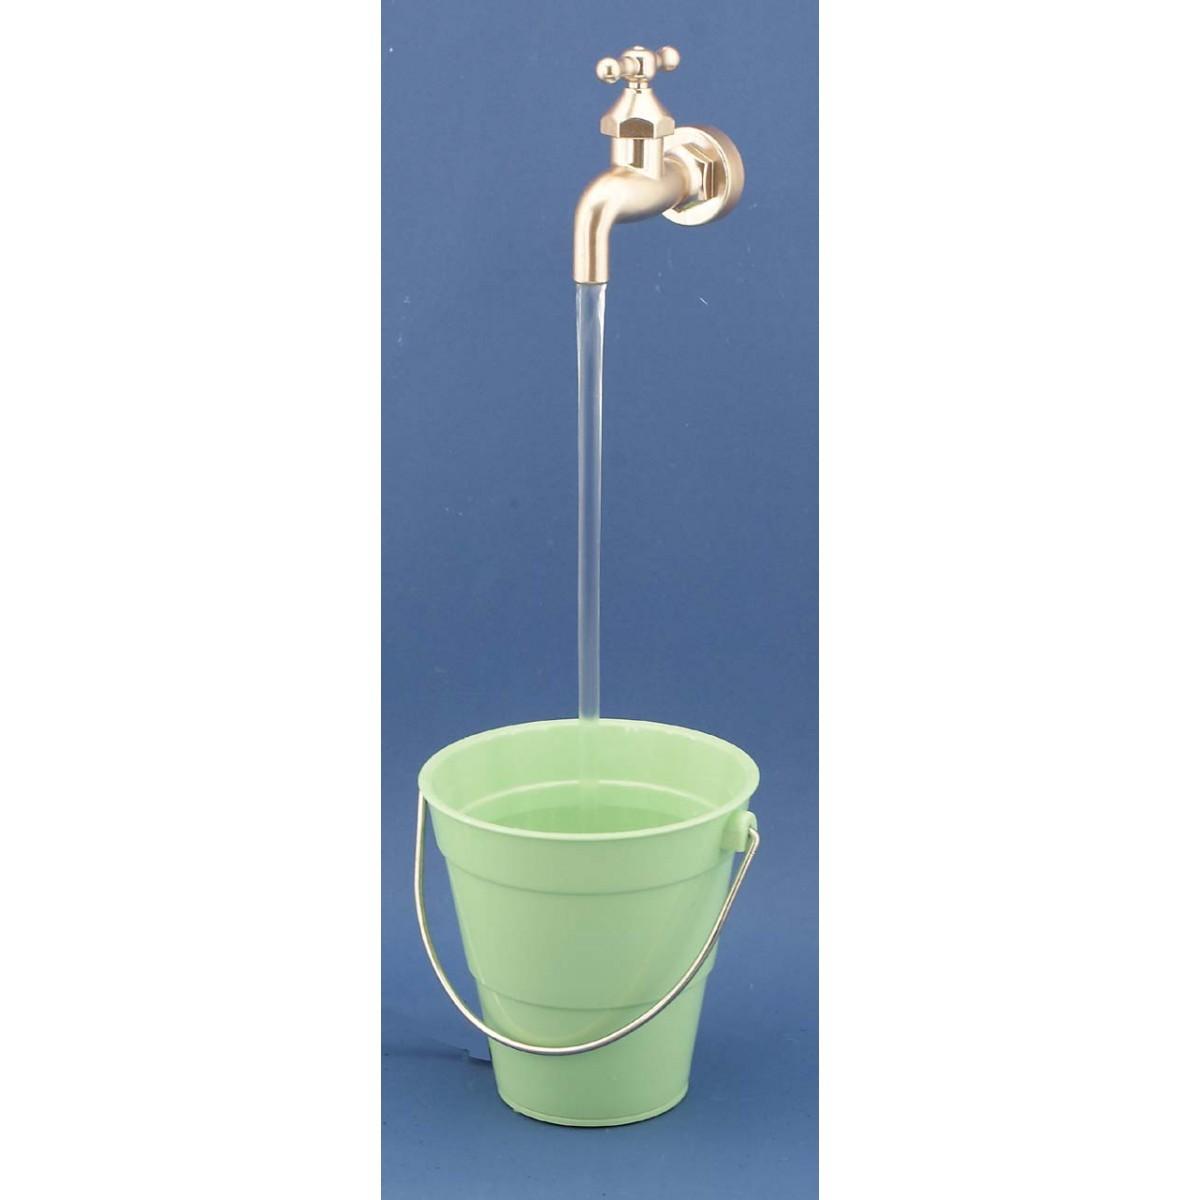 D coration robinet salle de bain blanc 31 robinet for Robinet salle de bain design pas cher